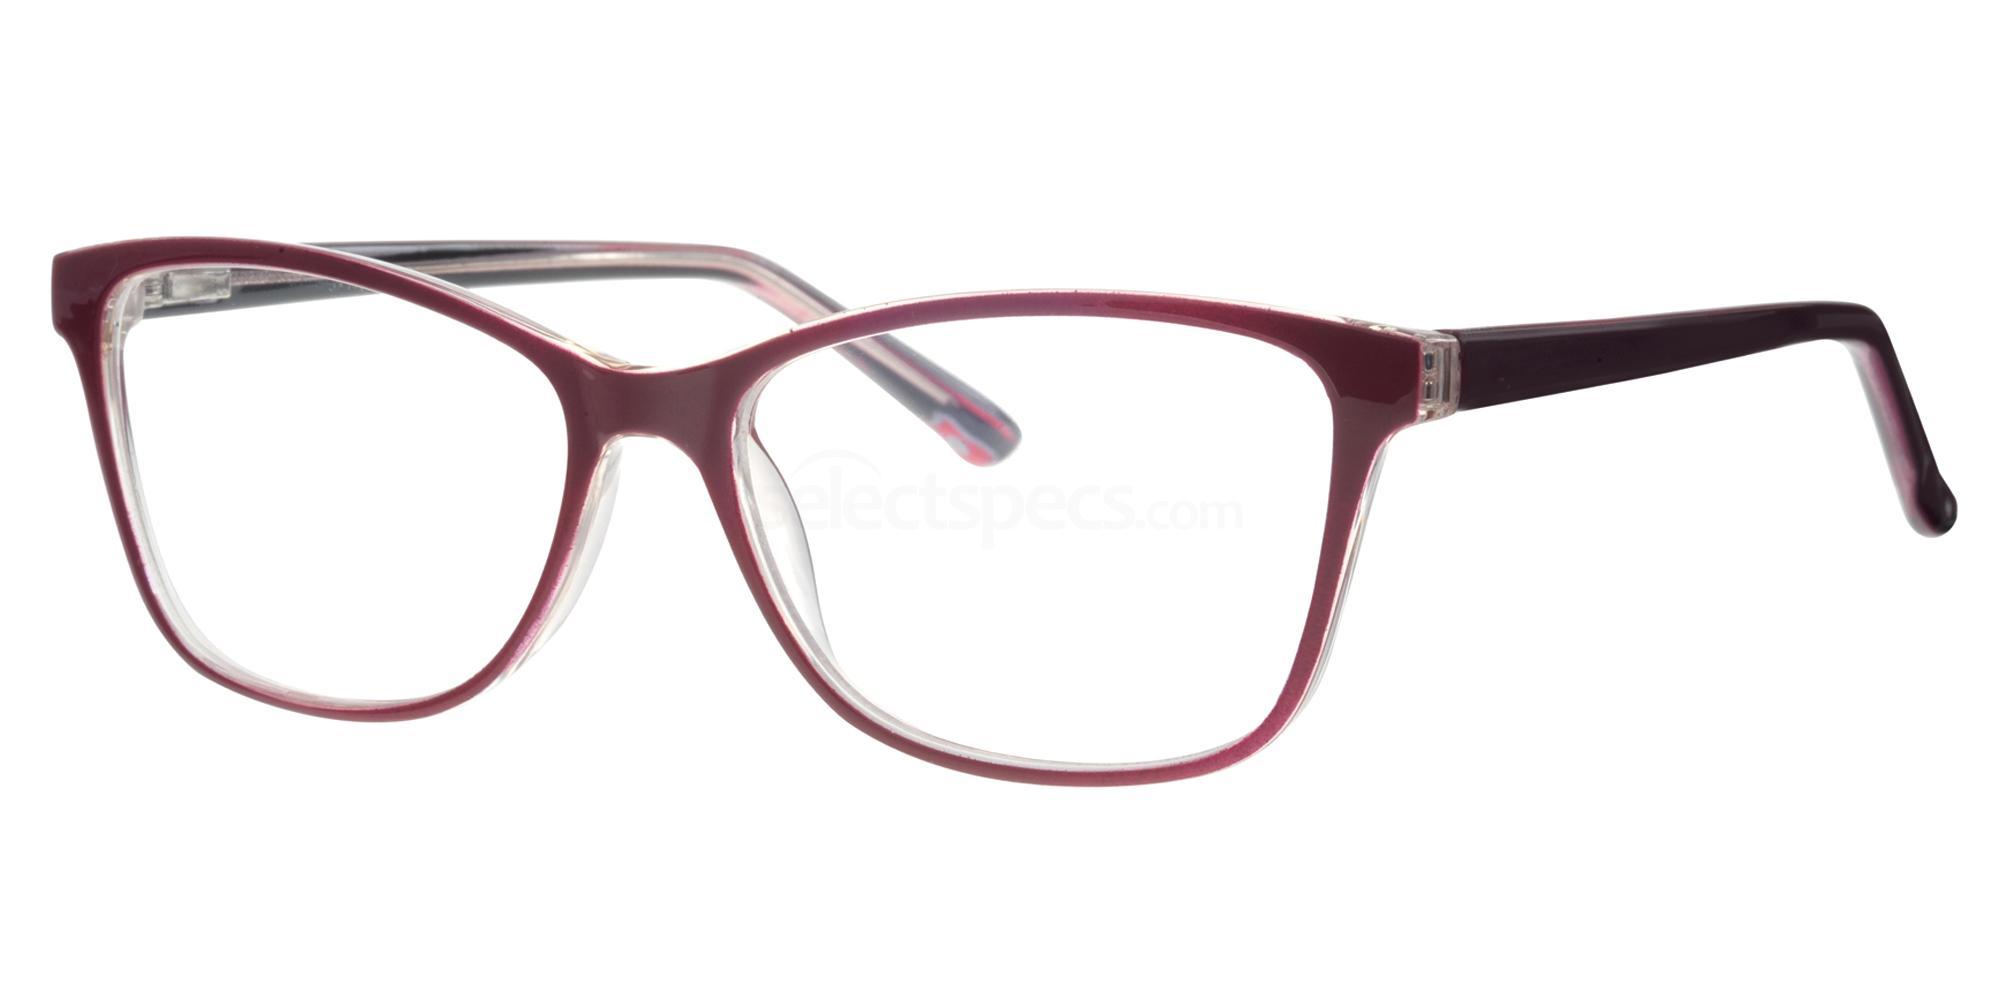 C20 4565 Glasses, Visage